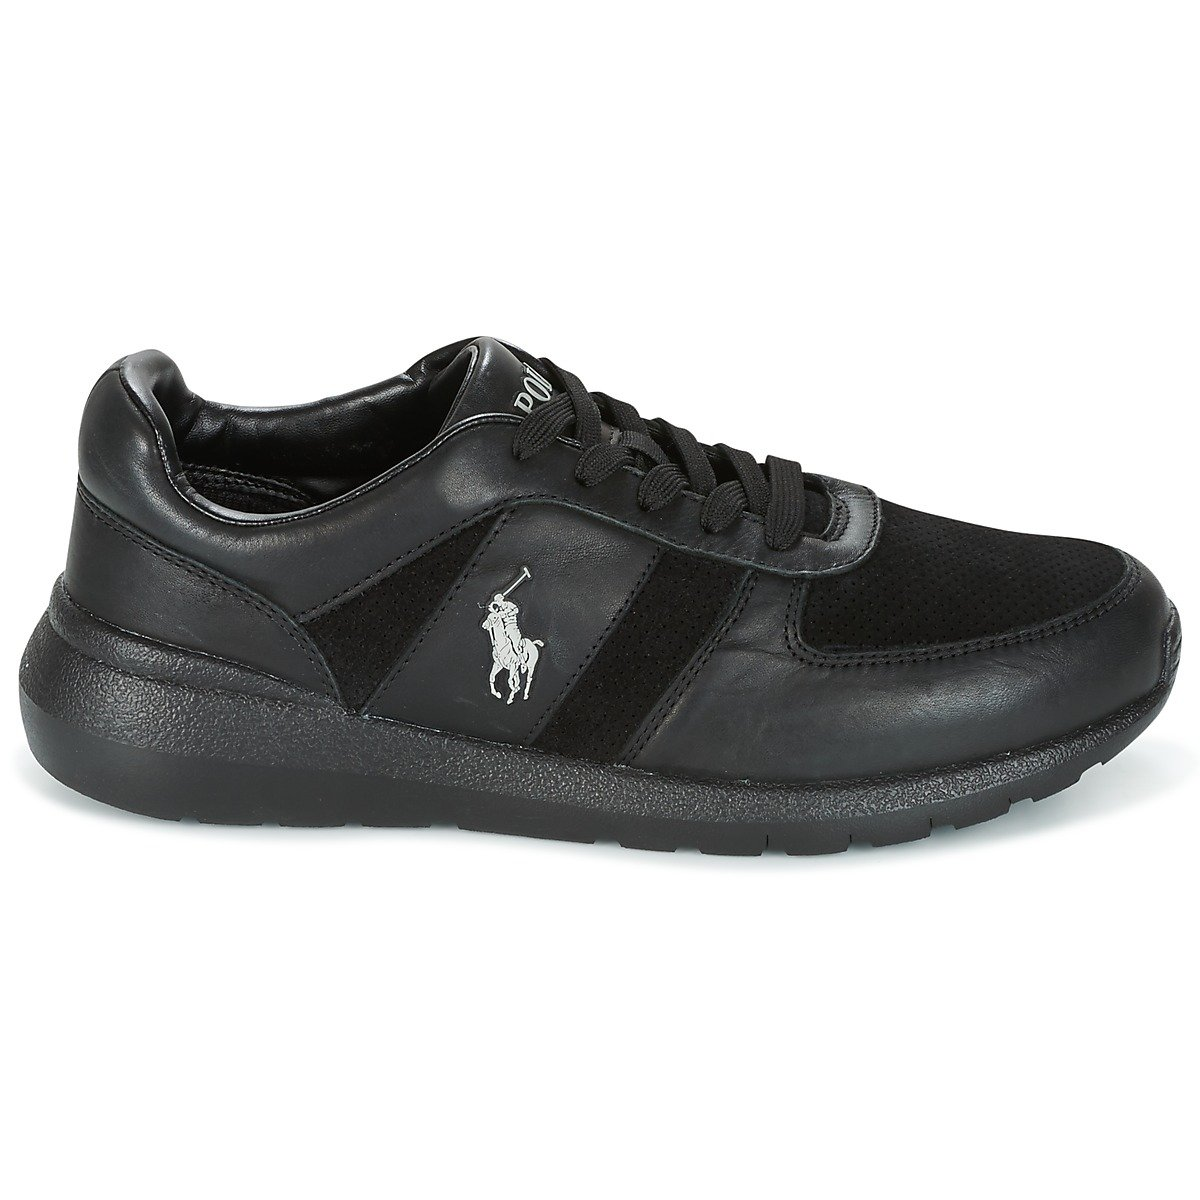 Zapatillas Polo Ralph Lauren Cordell - Color - Negro, Talla - 43 ...